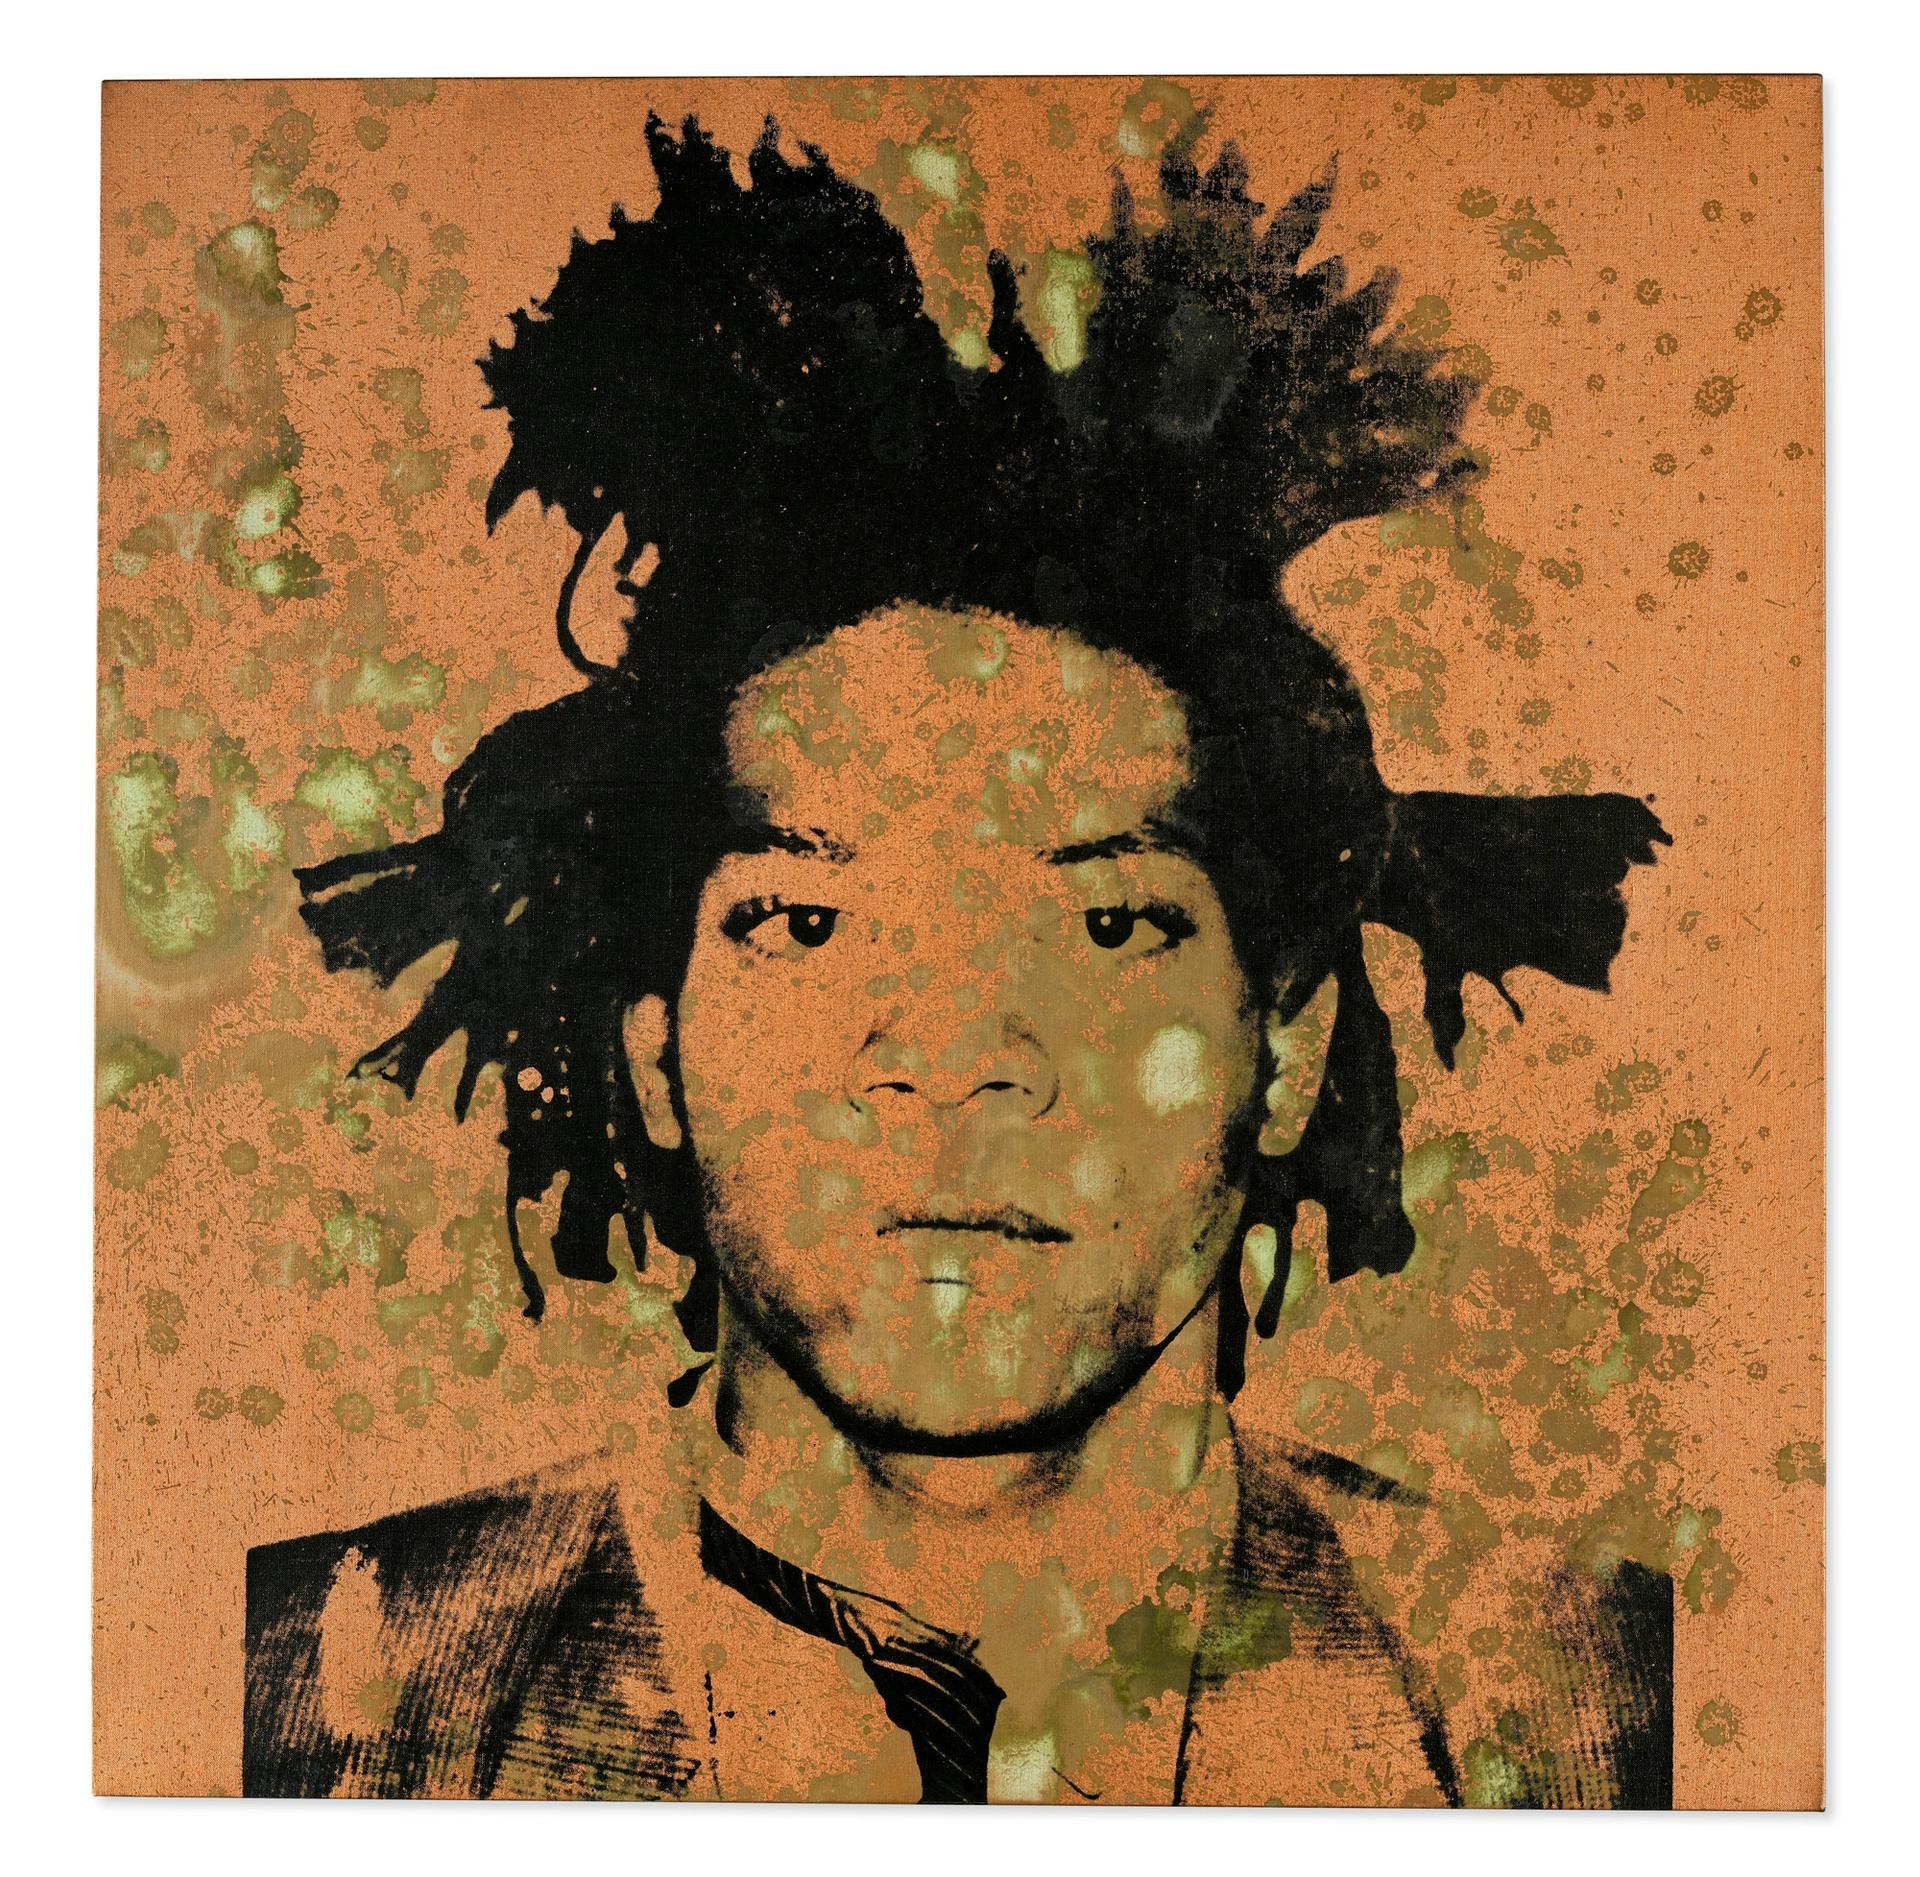 Jean-Michel Basquiat, 1982 © Andy Warhol, courtesy Christie's Images Ltd. 2021